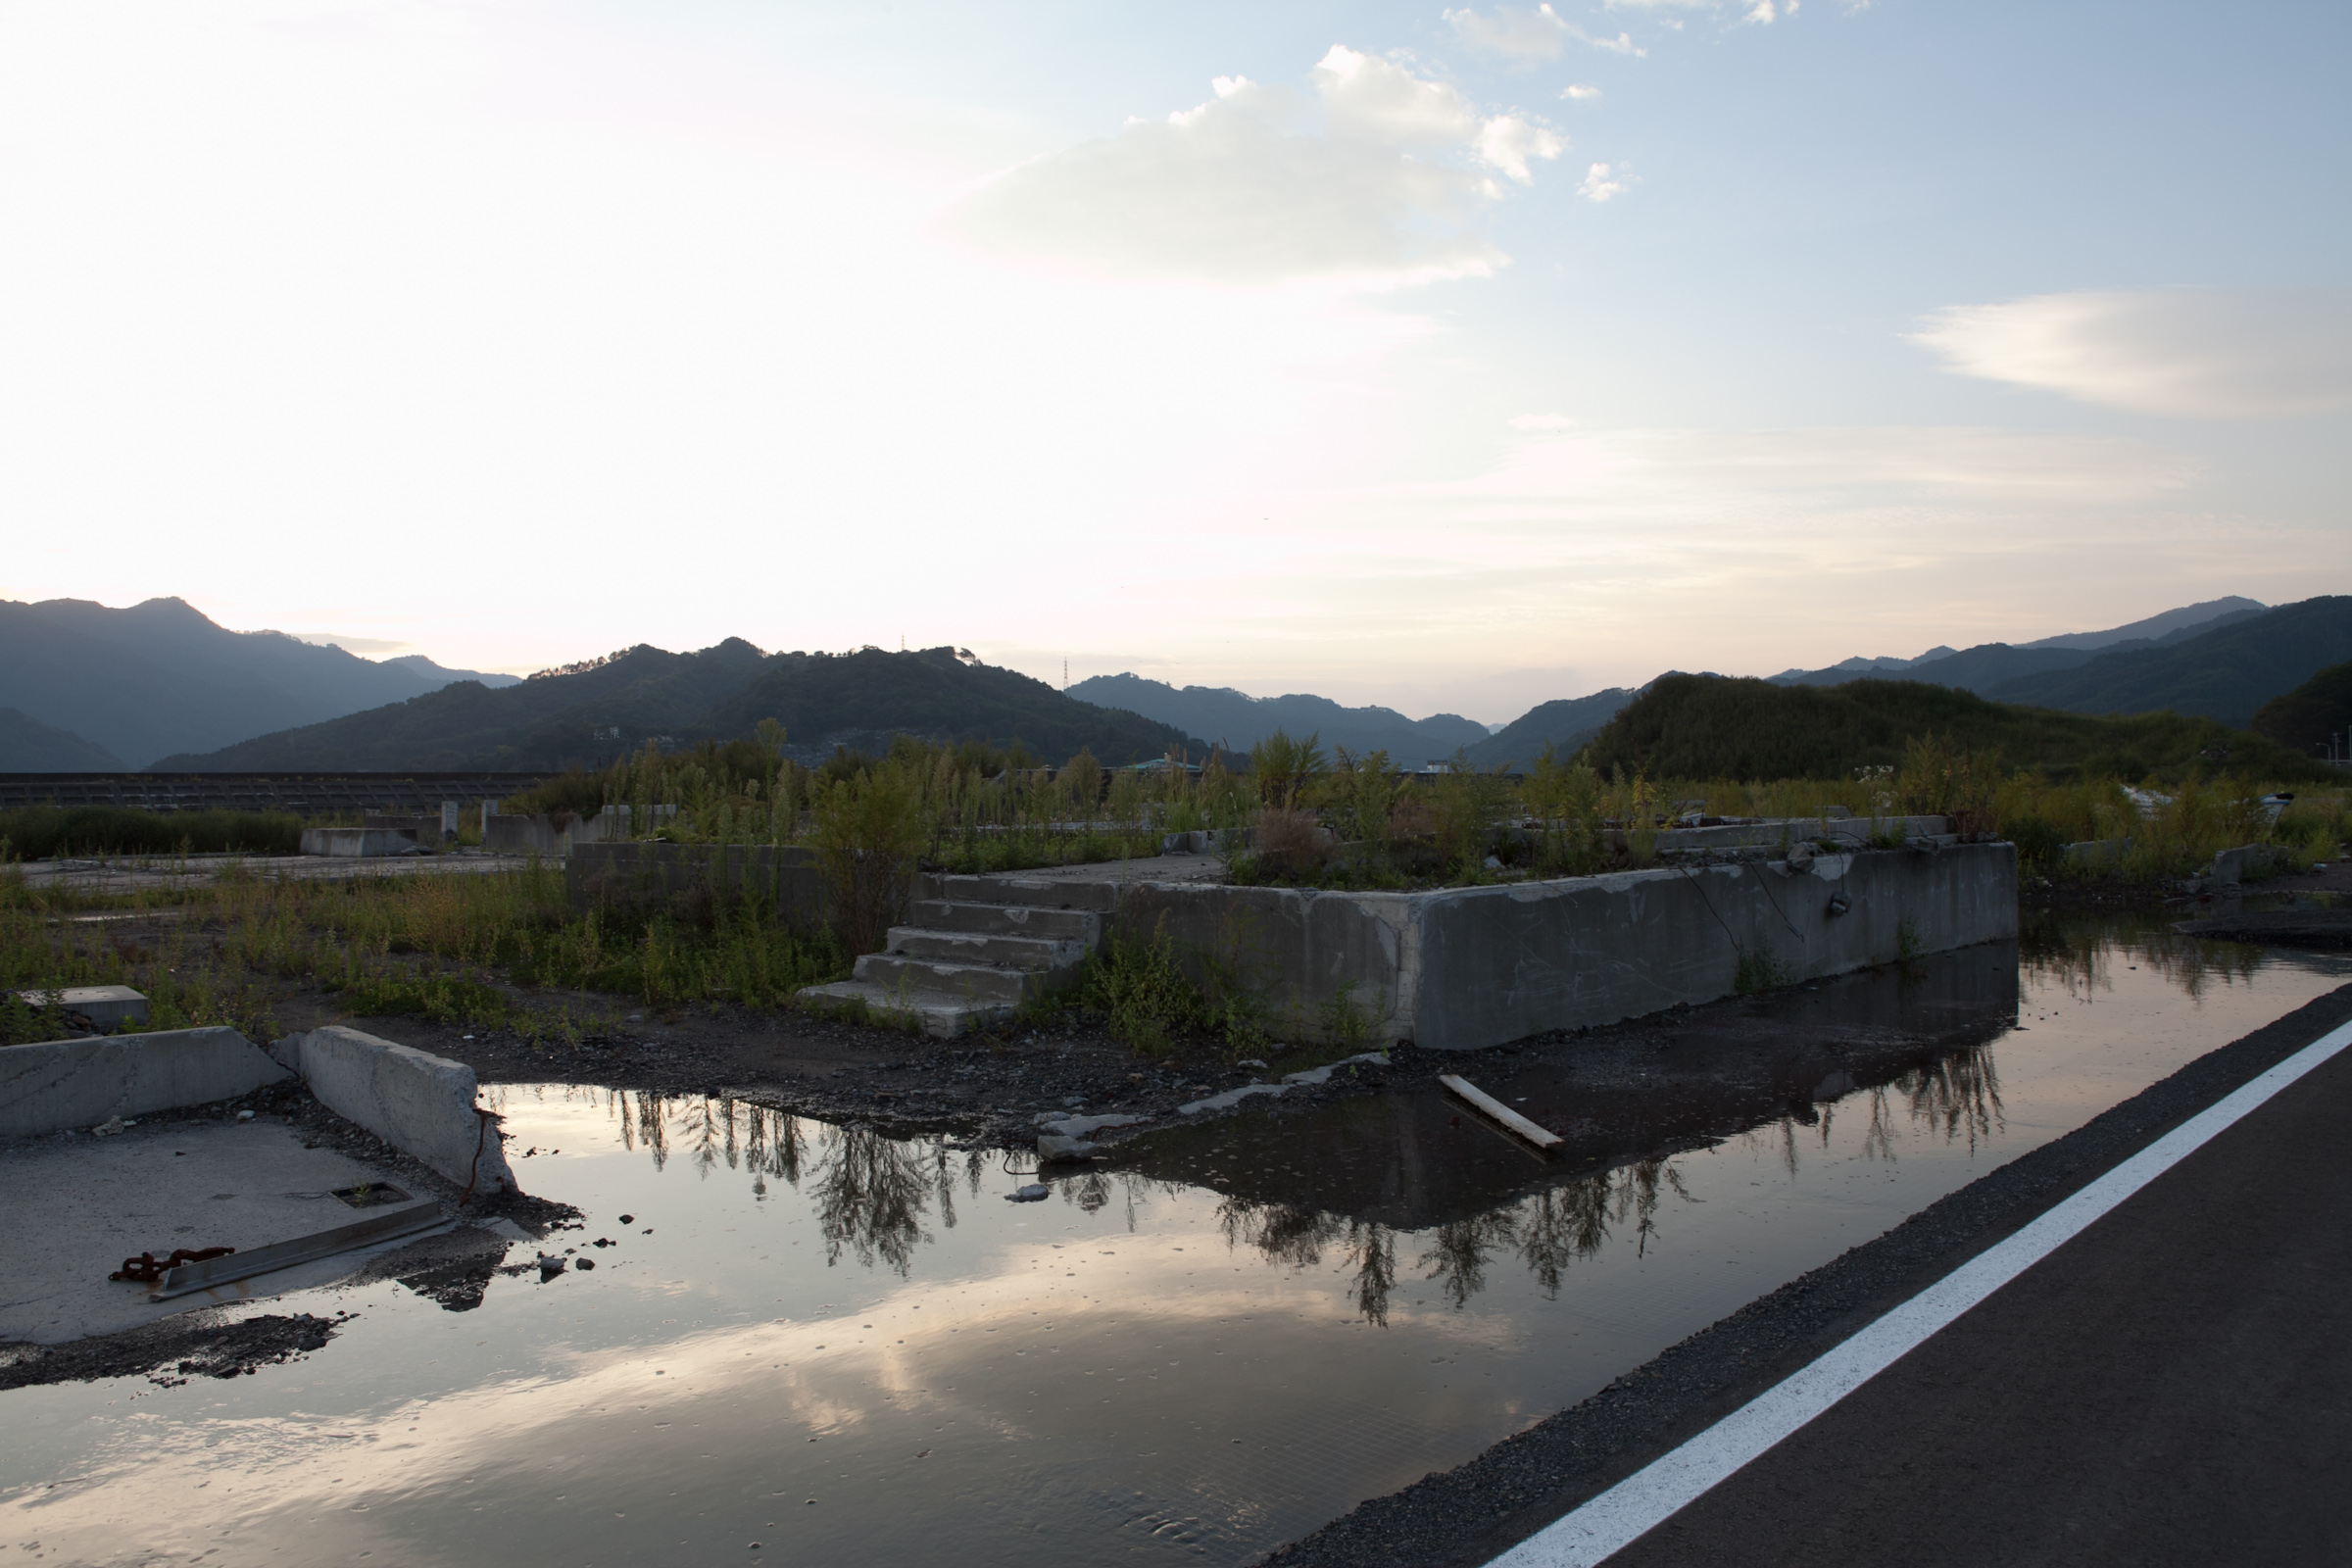 photo by   Mayumi Hirata